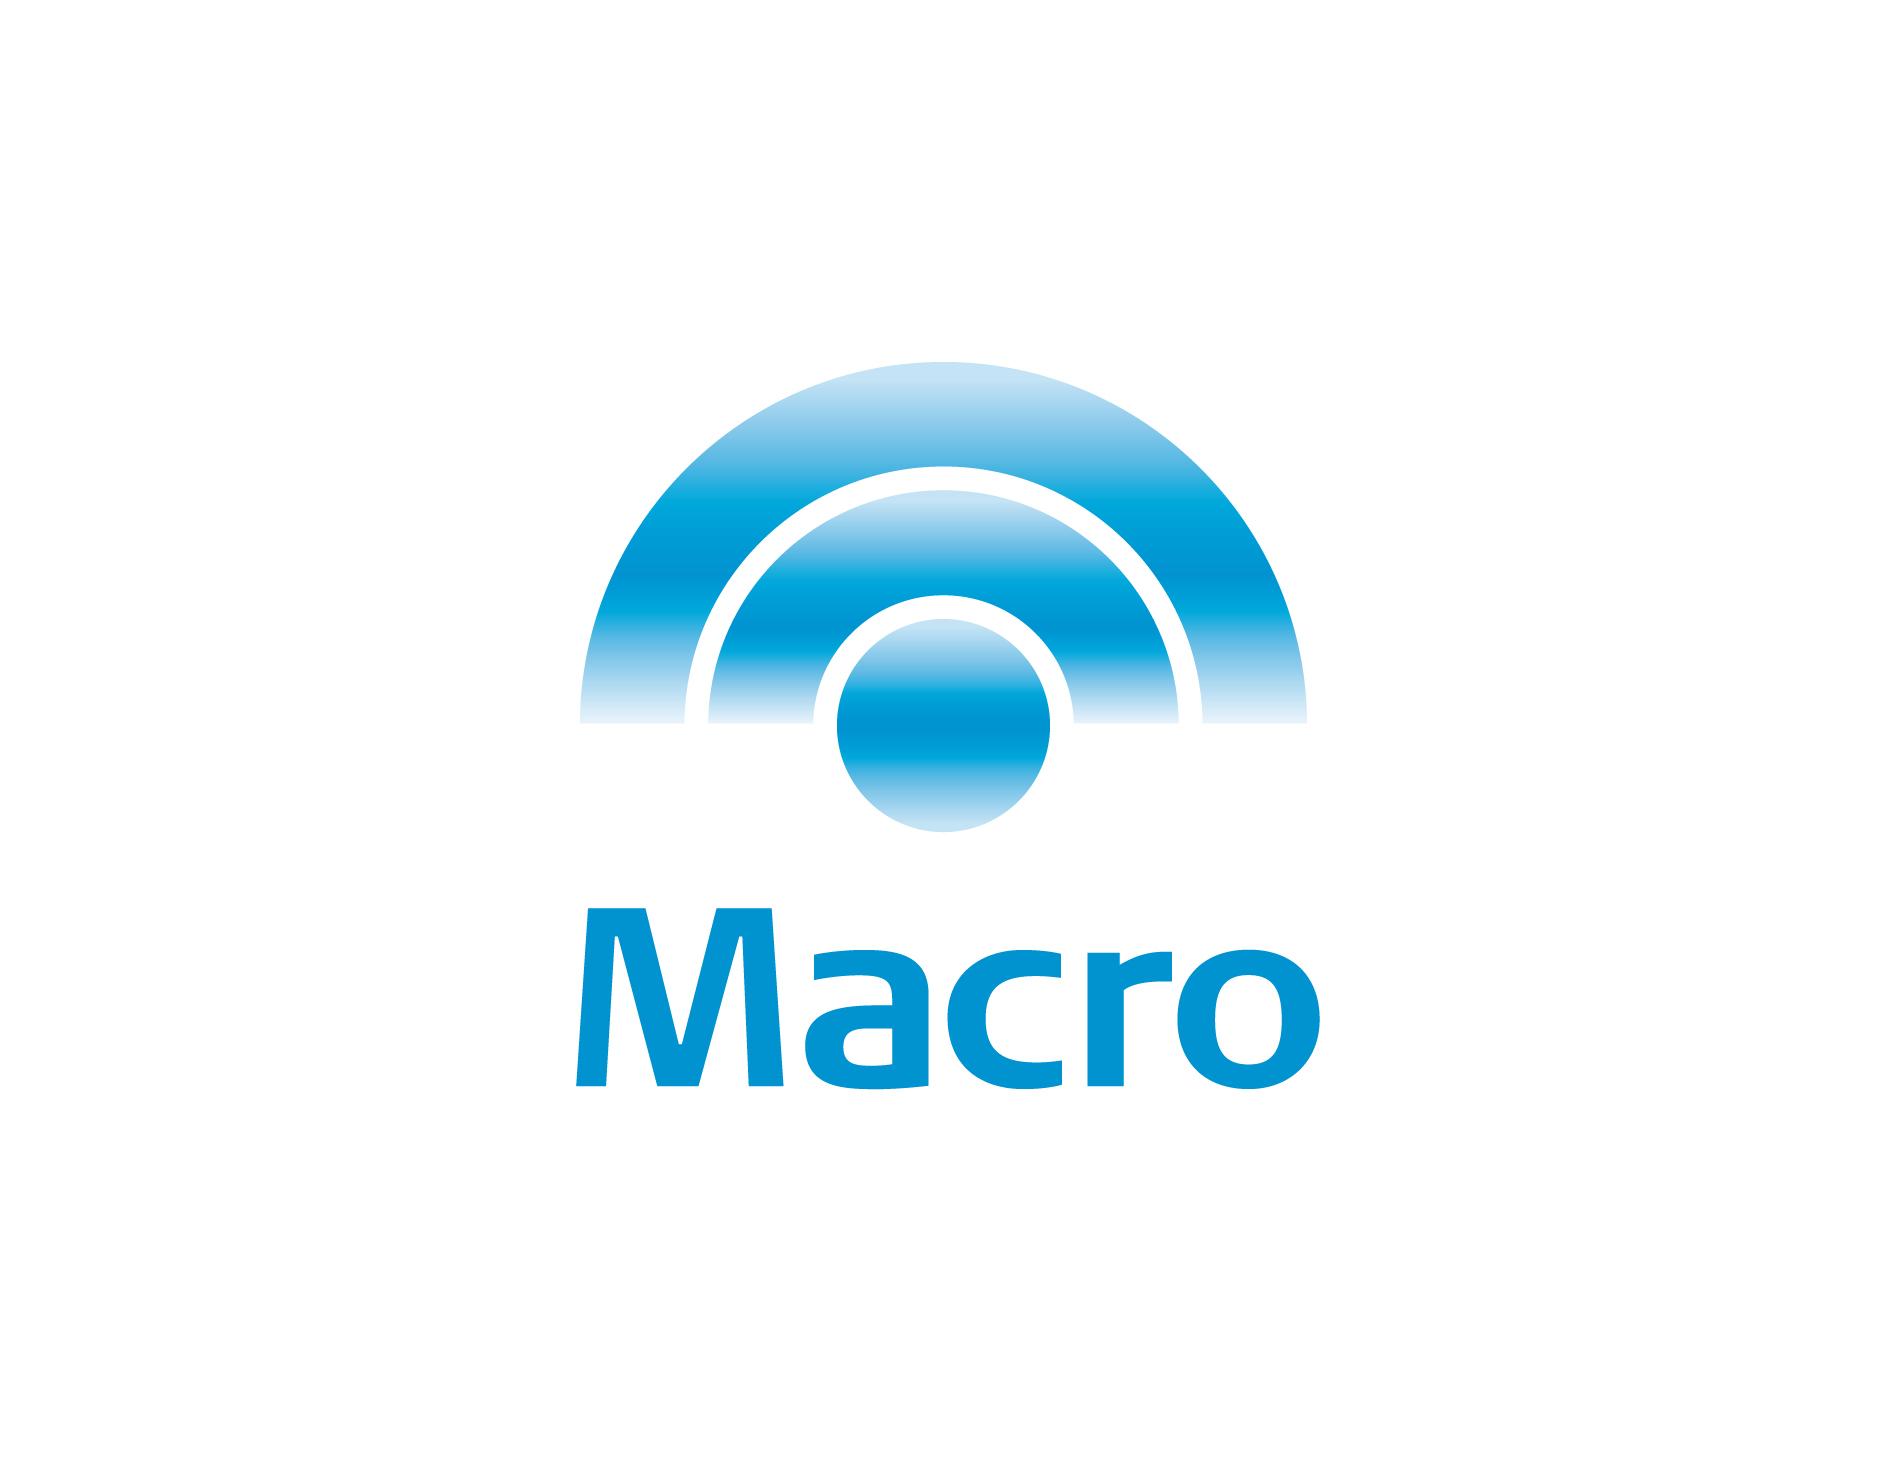 Banco Macro Bansud Logo photo - 1